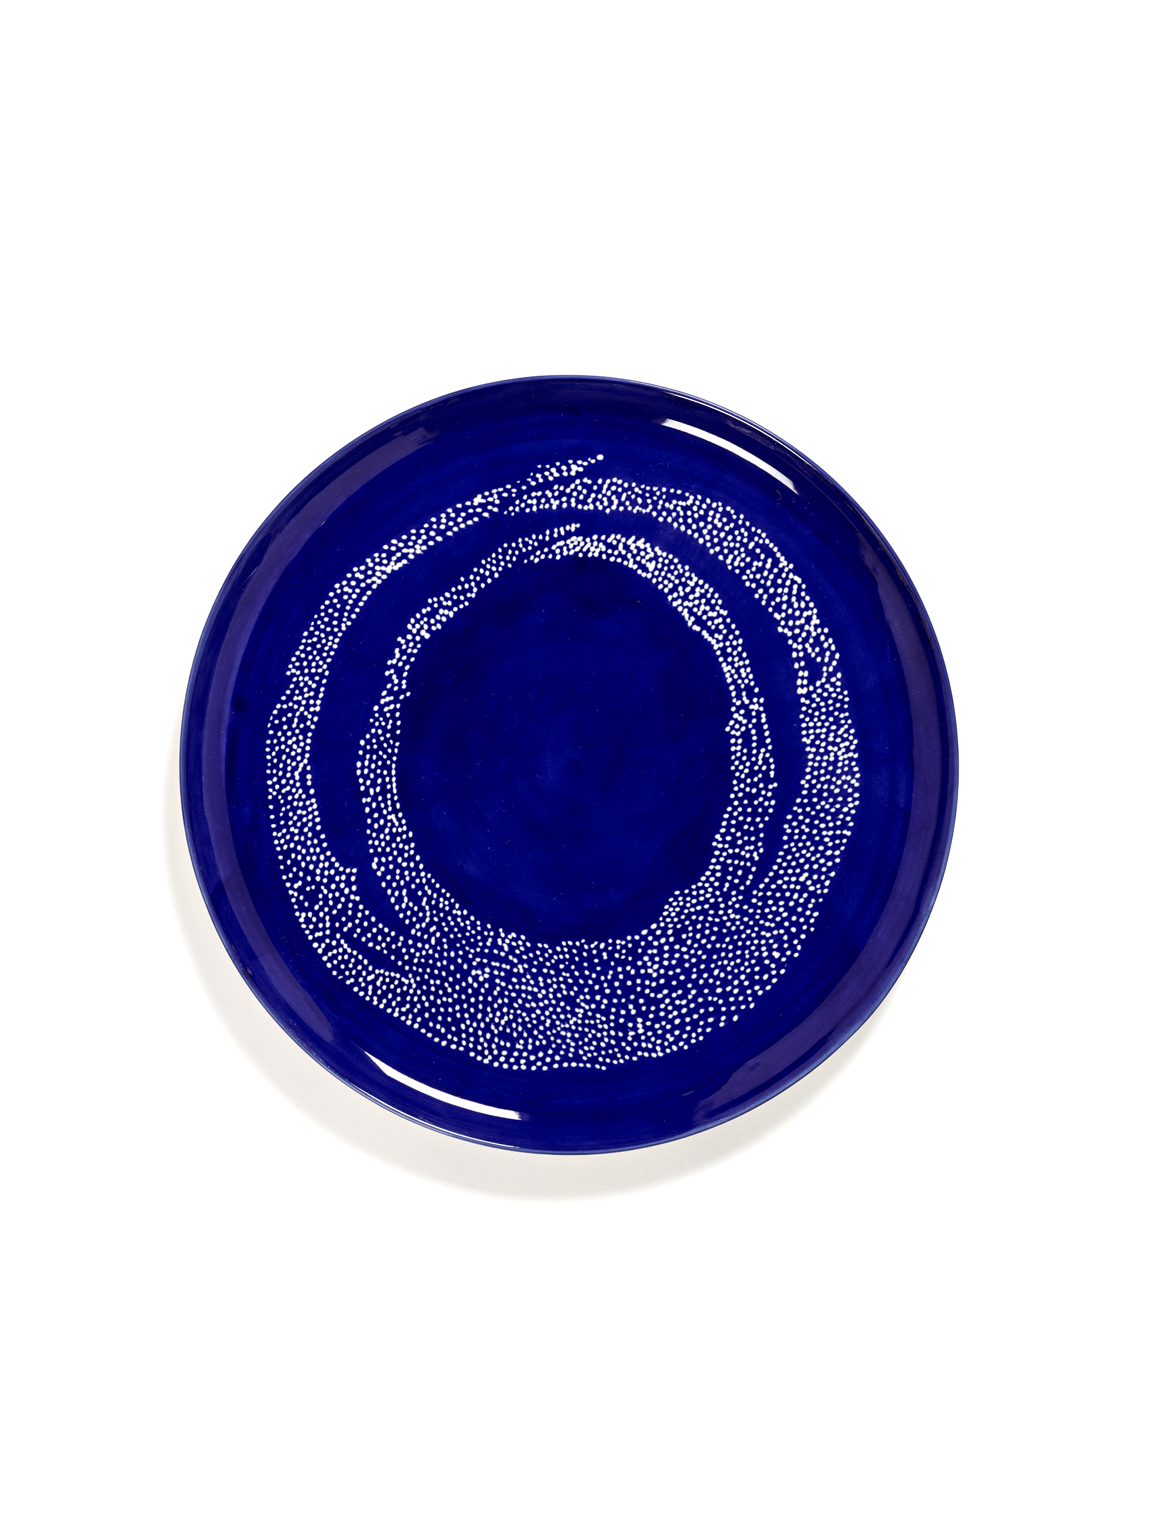 assiette de service feast lapis lazuli 35x35x2 B8921007I